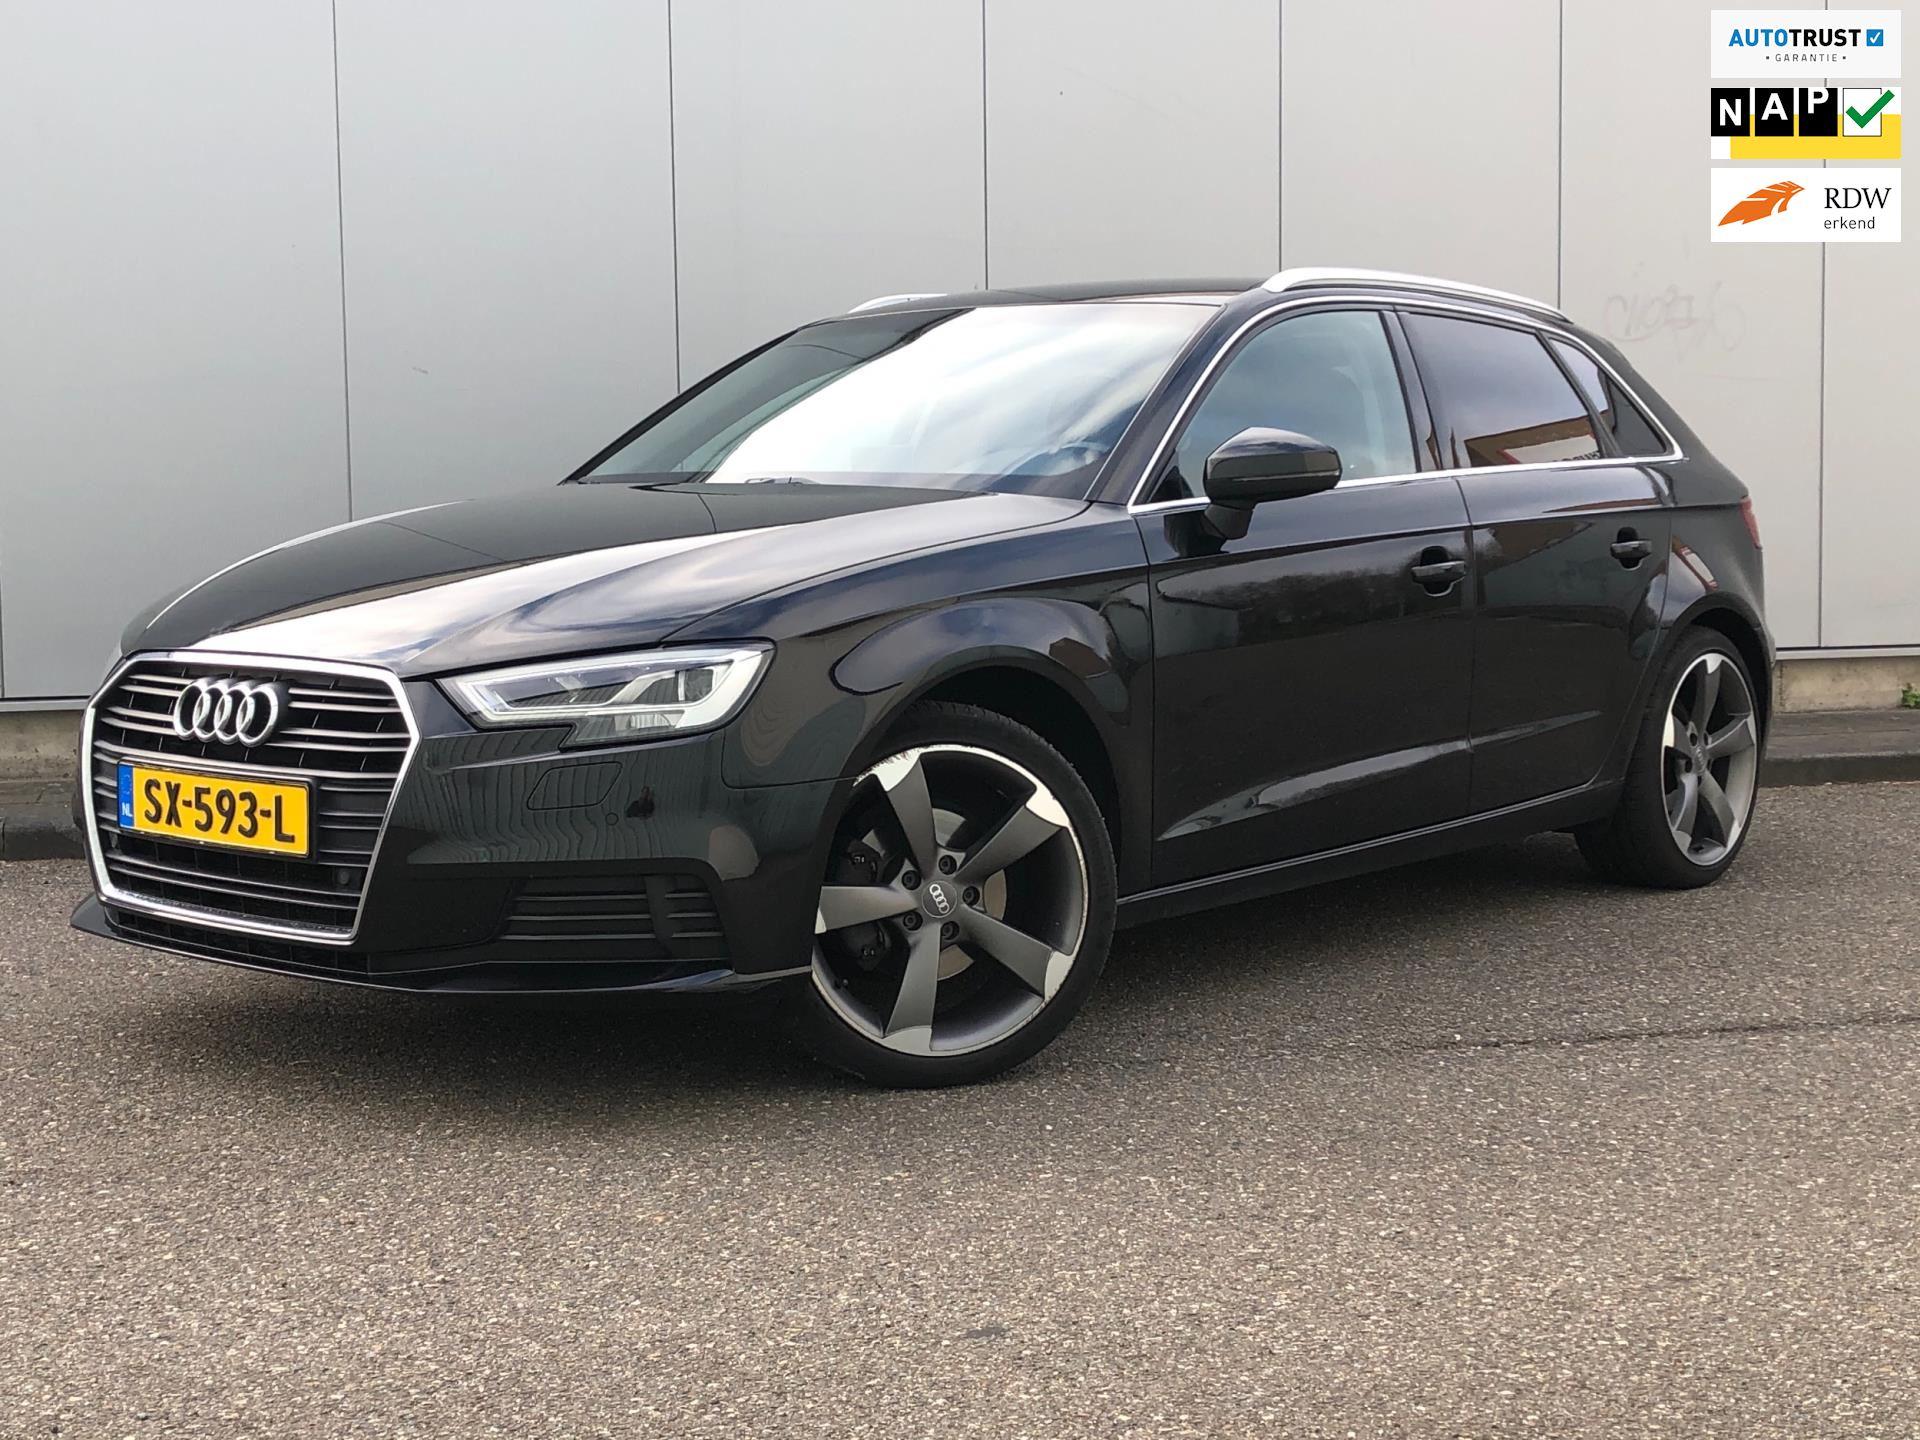 Audi A3 Sportback occasion - Heel Holland Rijdt